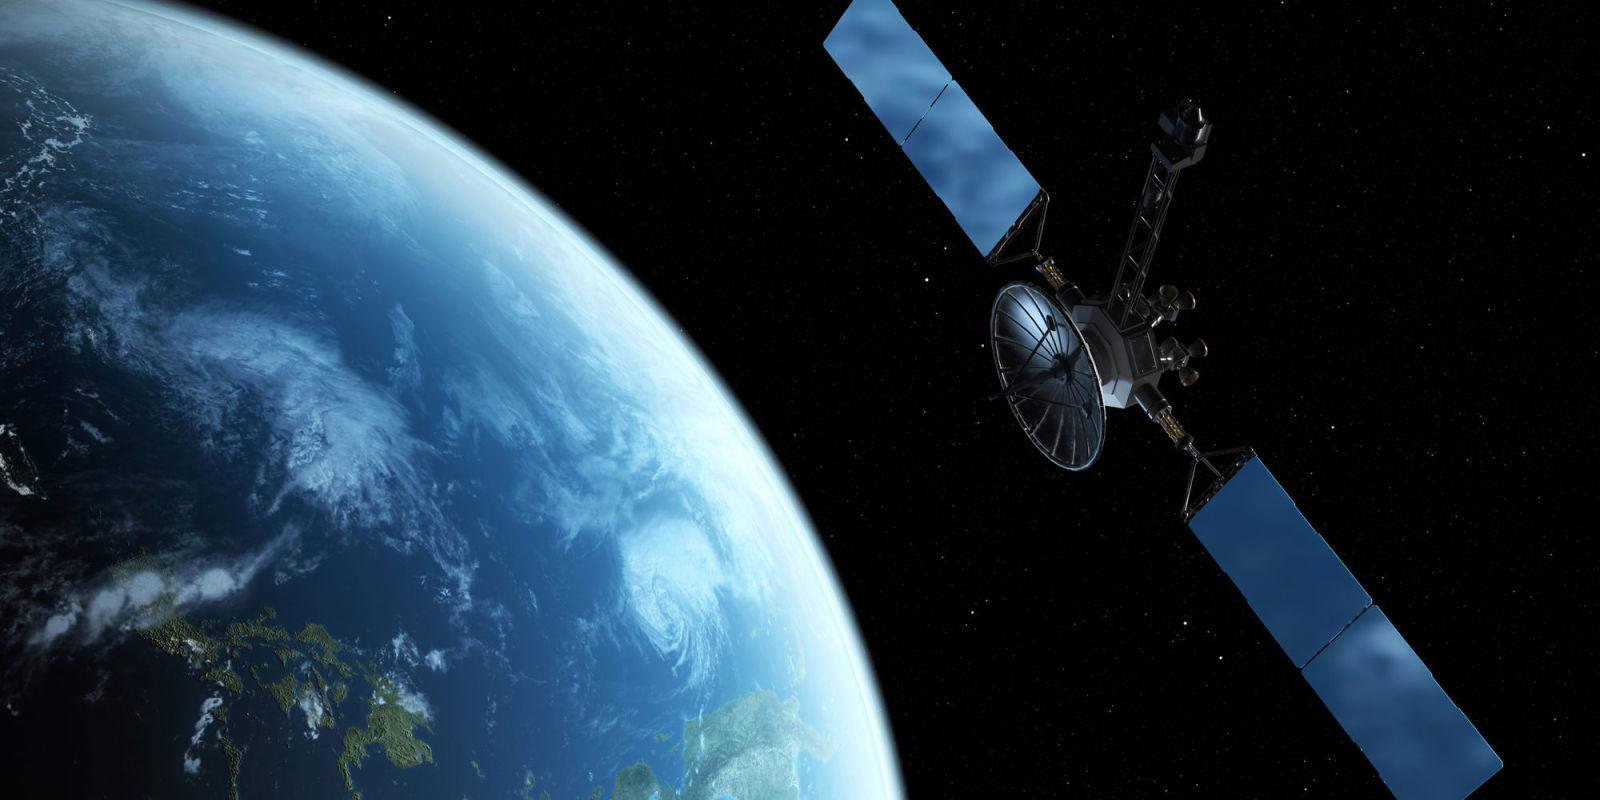 spacecraft and satellite - photo #43